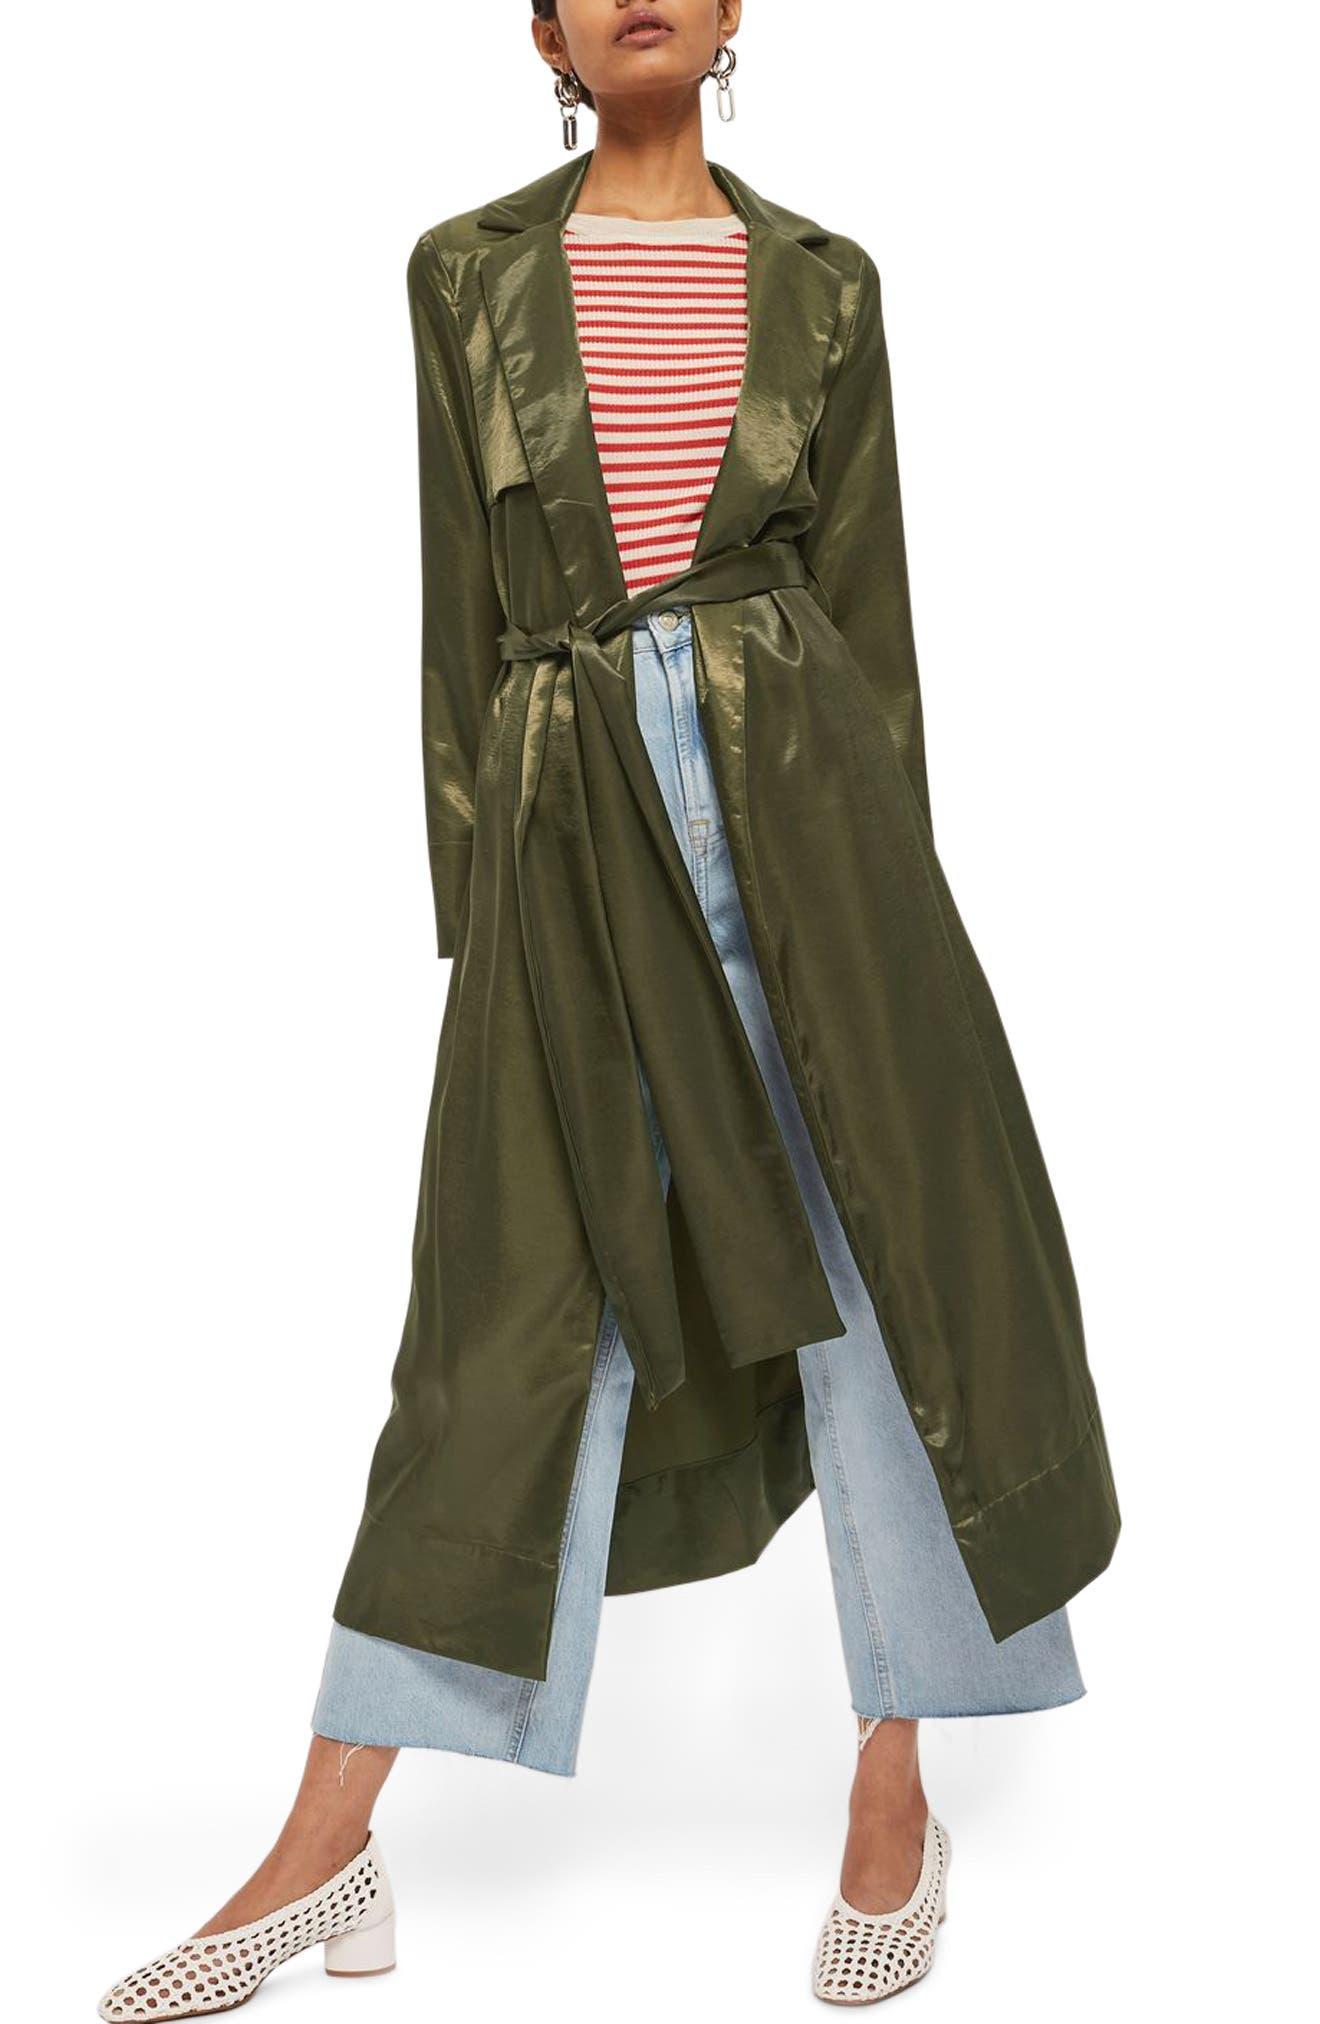 Alternate Image 1 Selected - Topshop Belted Satin Duster Coat